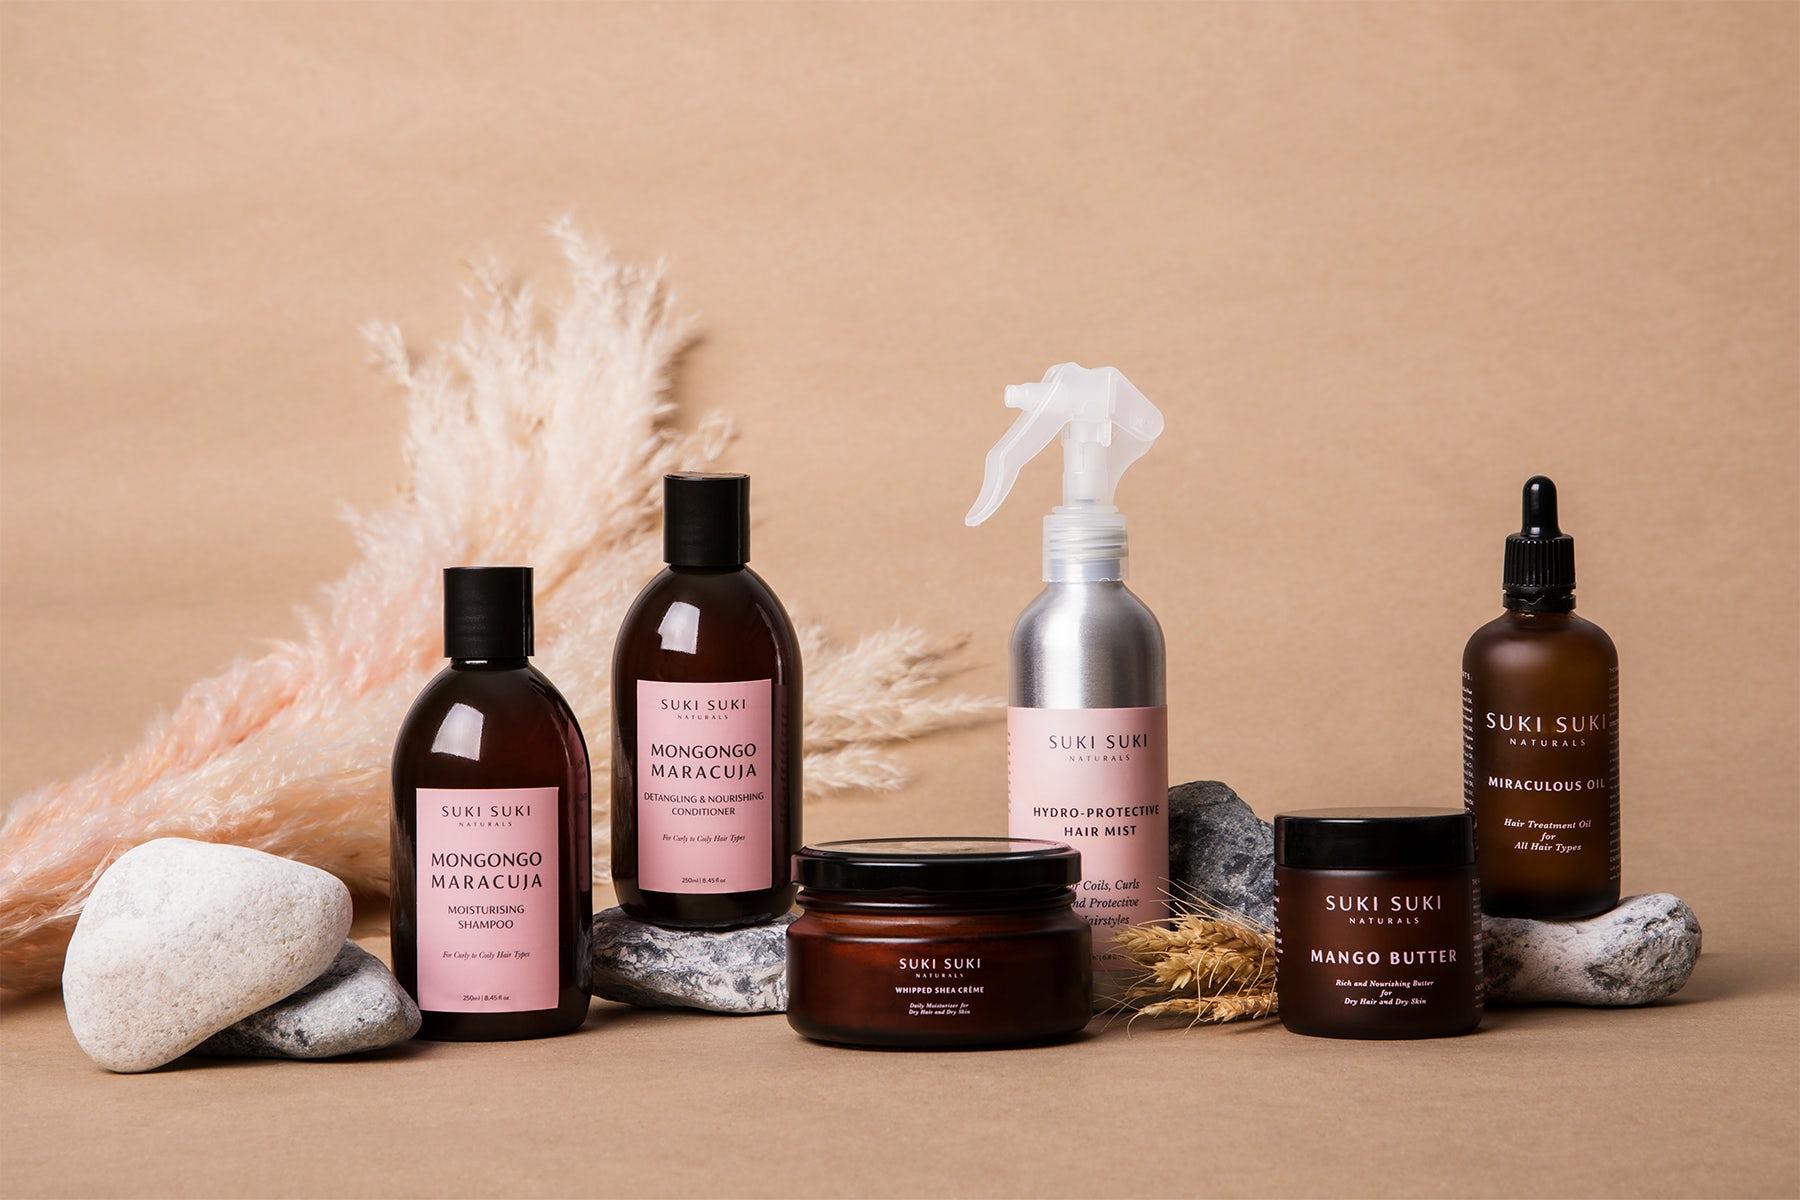 Suki Suki Naturals haircare products. Suki Suki Naturals.